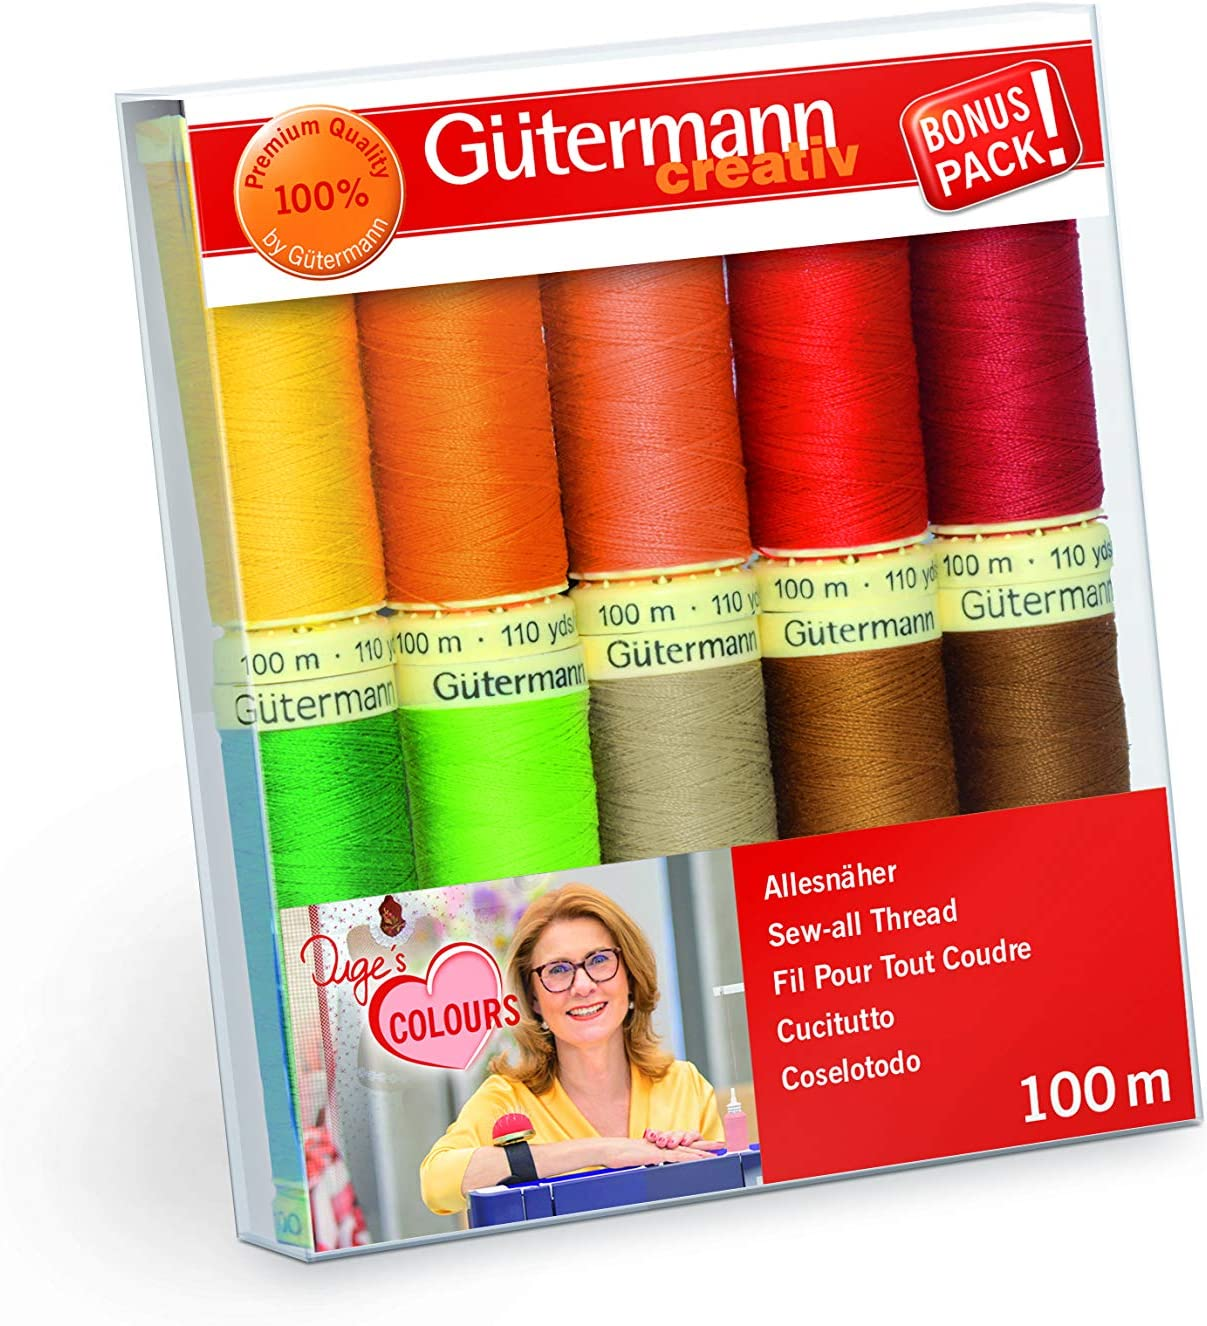 70 m x 20 Spulen Gutermann GUT/_702165-1 Stickgarn-Set Polyester mehrfarbig Einheitsgr/ö/ße